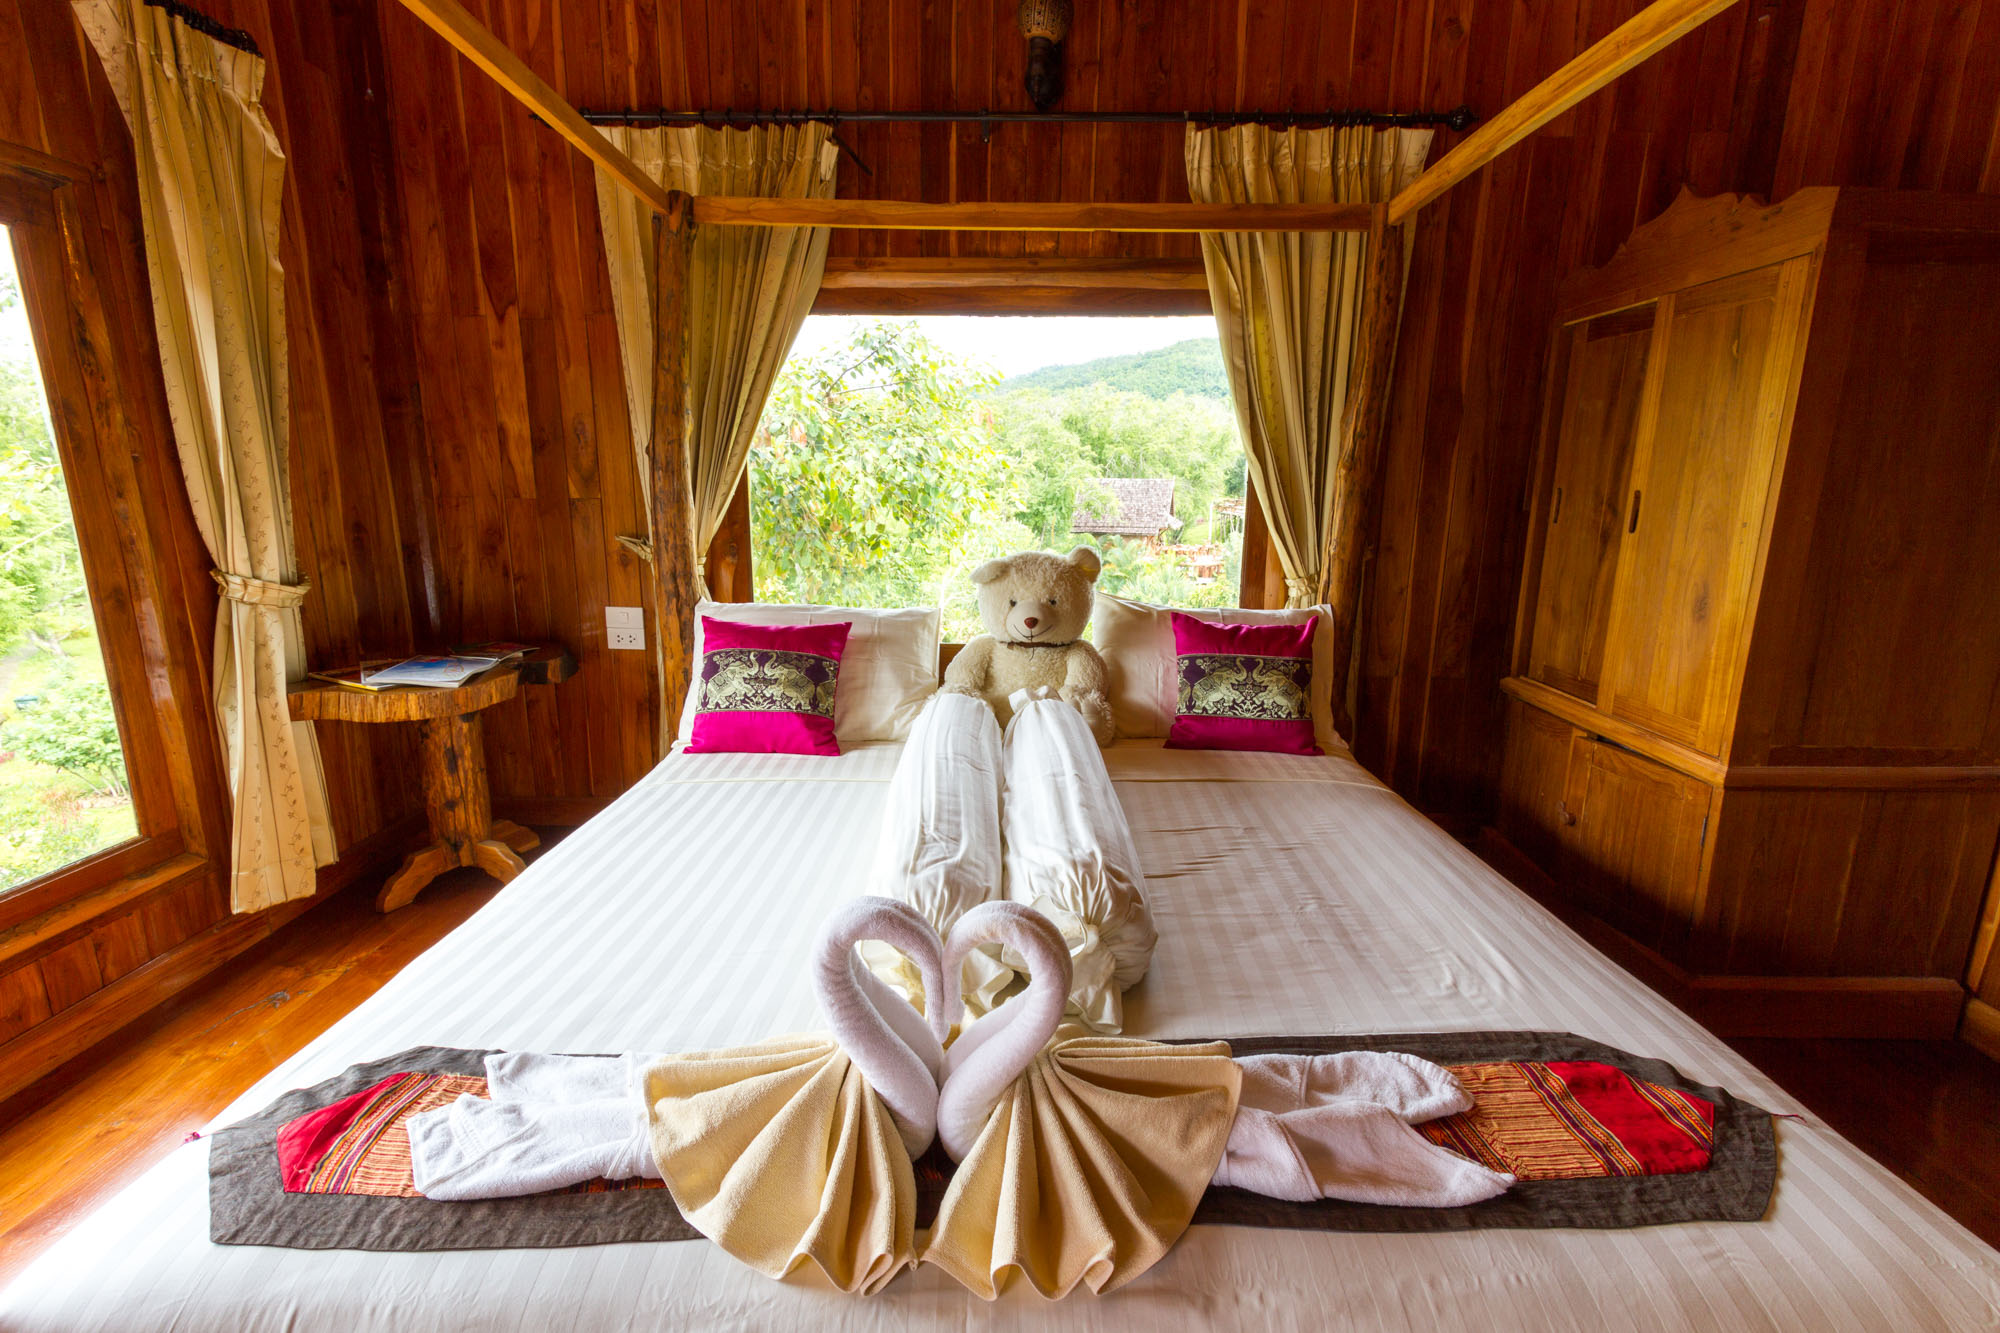 Mokfahsai Resort หมอกฟ้าใสรีสอร์ท  หมอกฟ้าใสรีสอร์ท Swiss Zealand แห่งเดียวบนเนินเขาแม่สอด IMG 9214